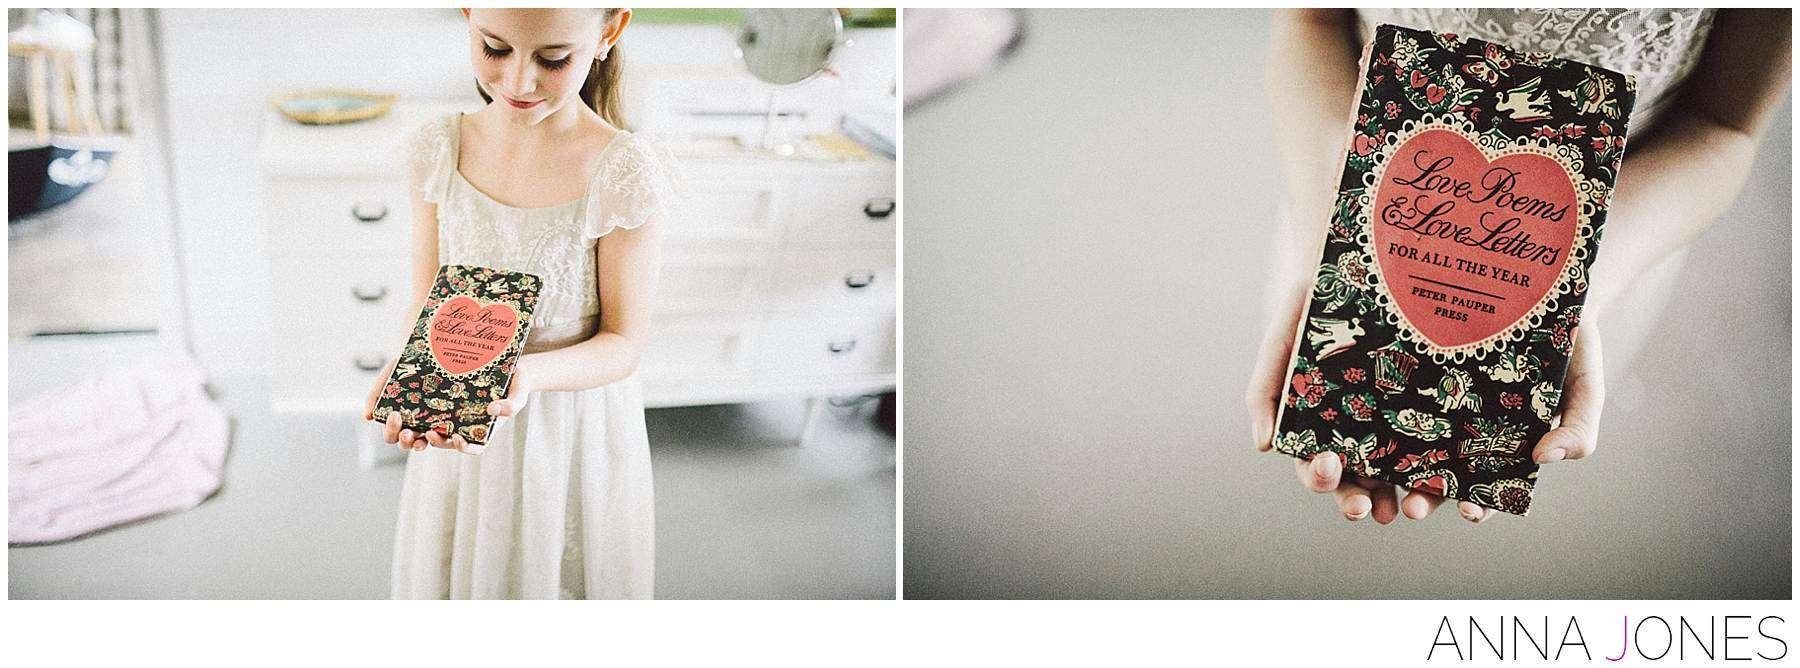 By Anna Jones. Wedding Photographer.